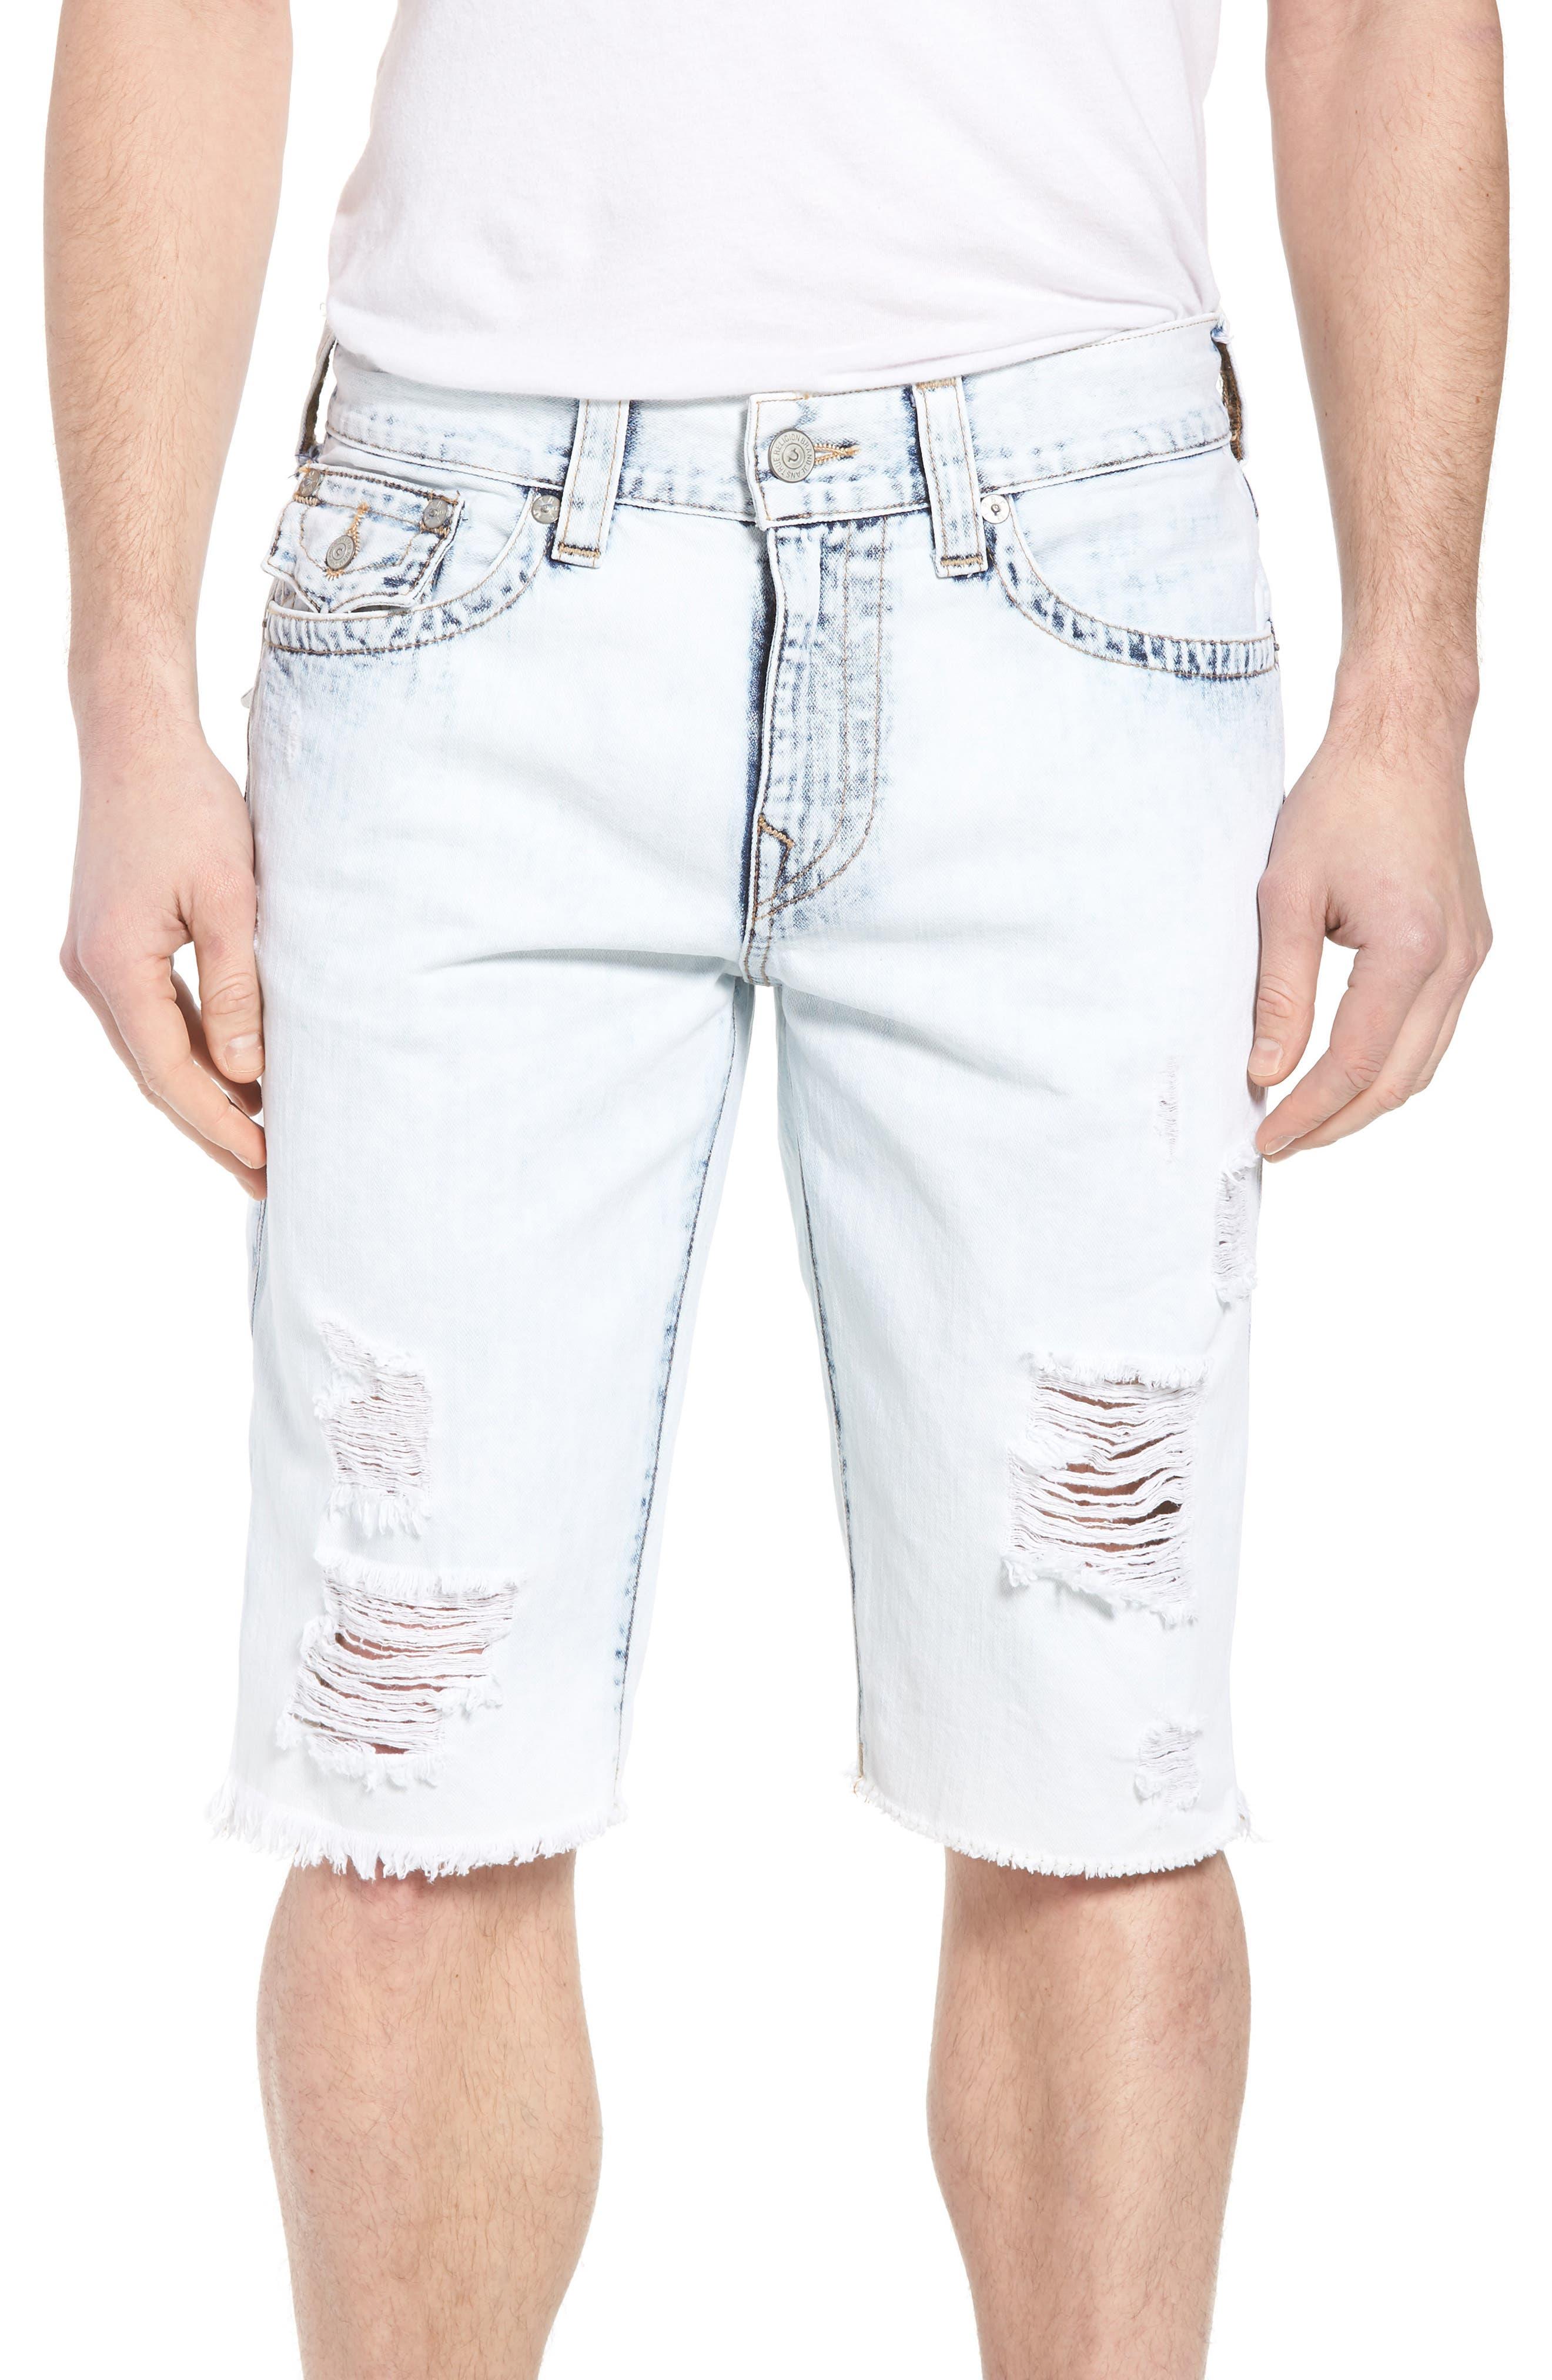 Geno Denim Shorts,                         Main,                         color, 401